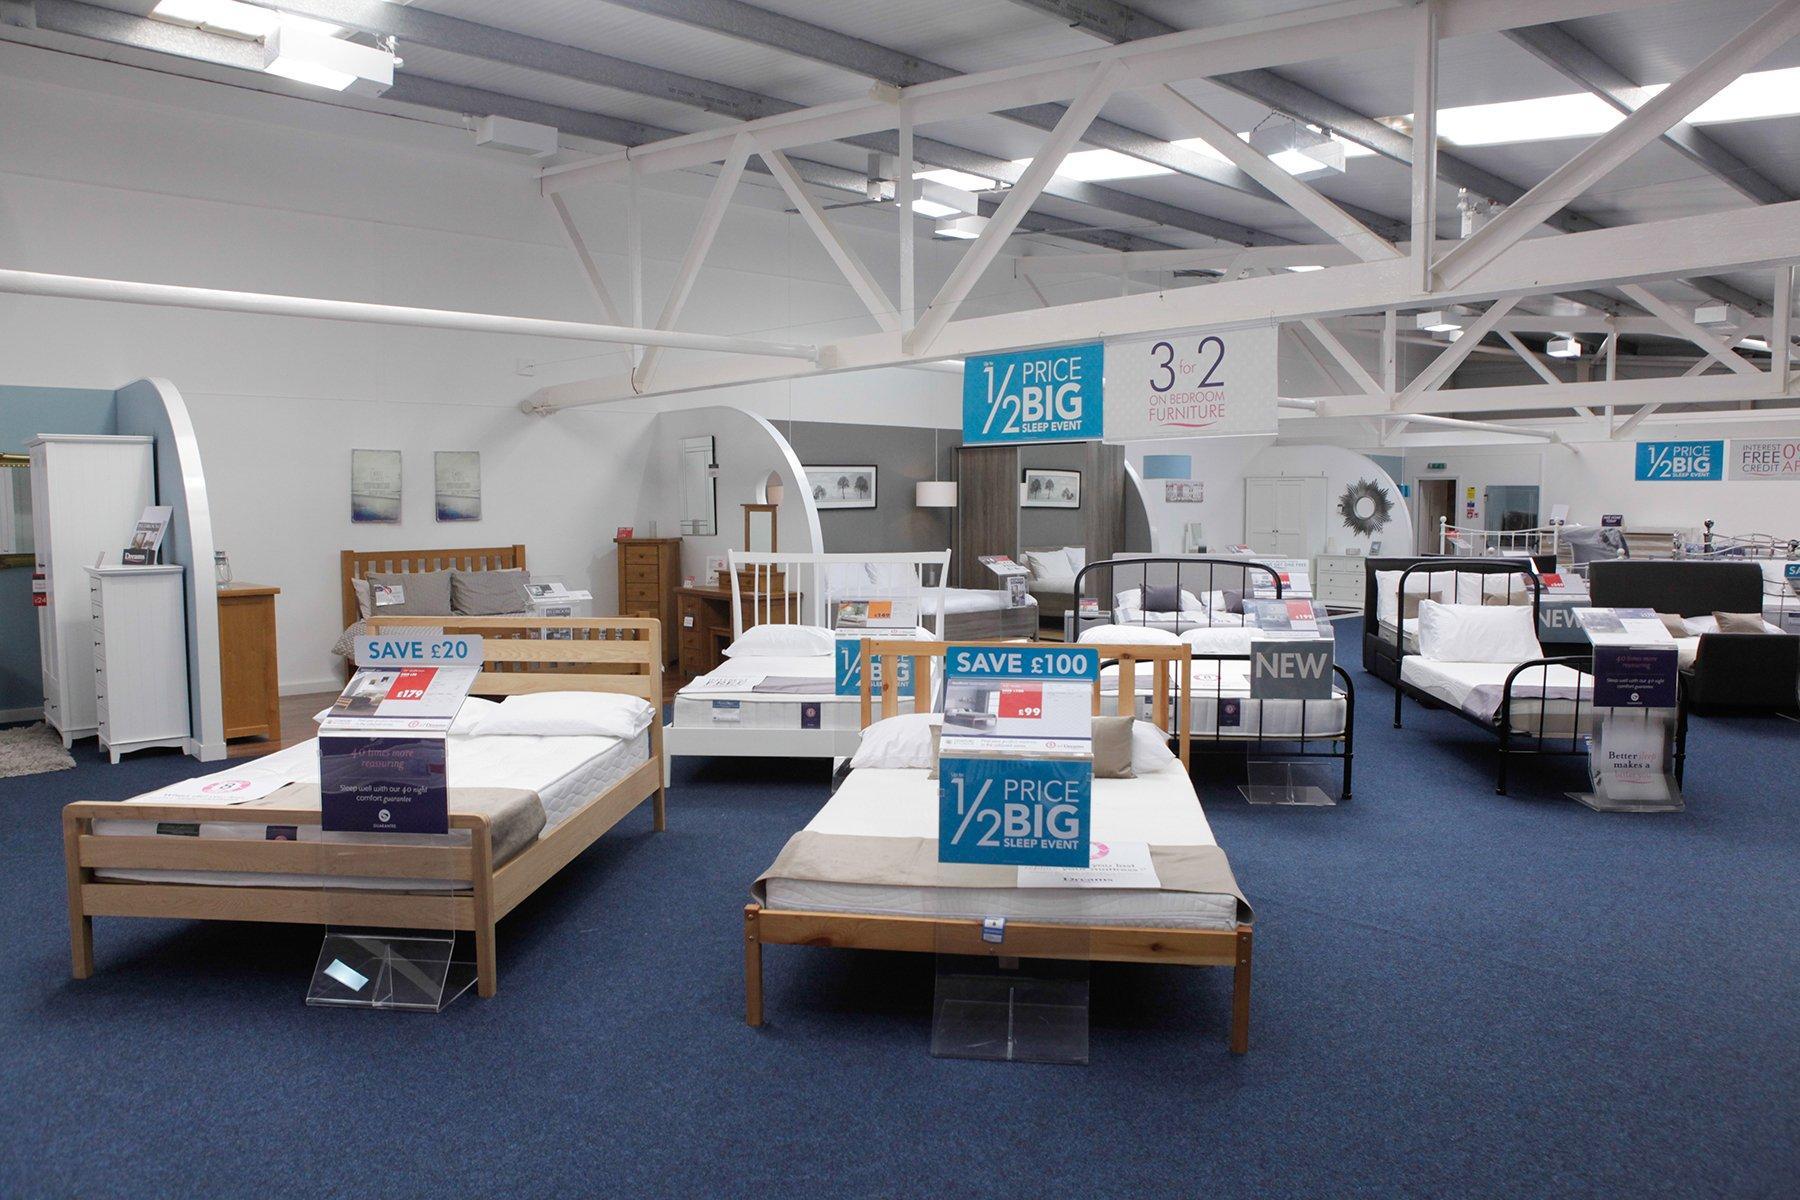 sofa beds reading berkshire best microfiber dreams store in mattresses furniture